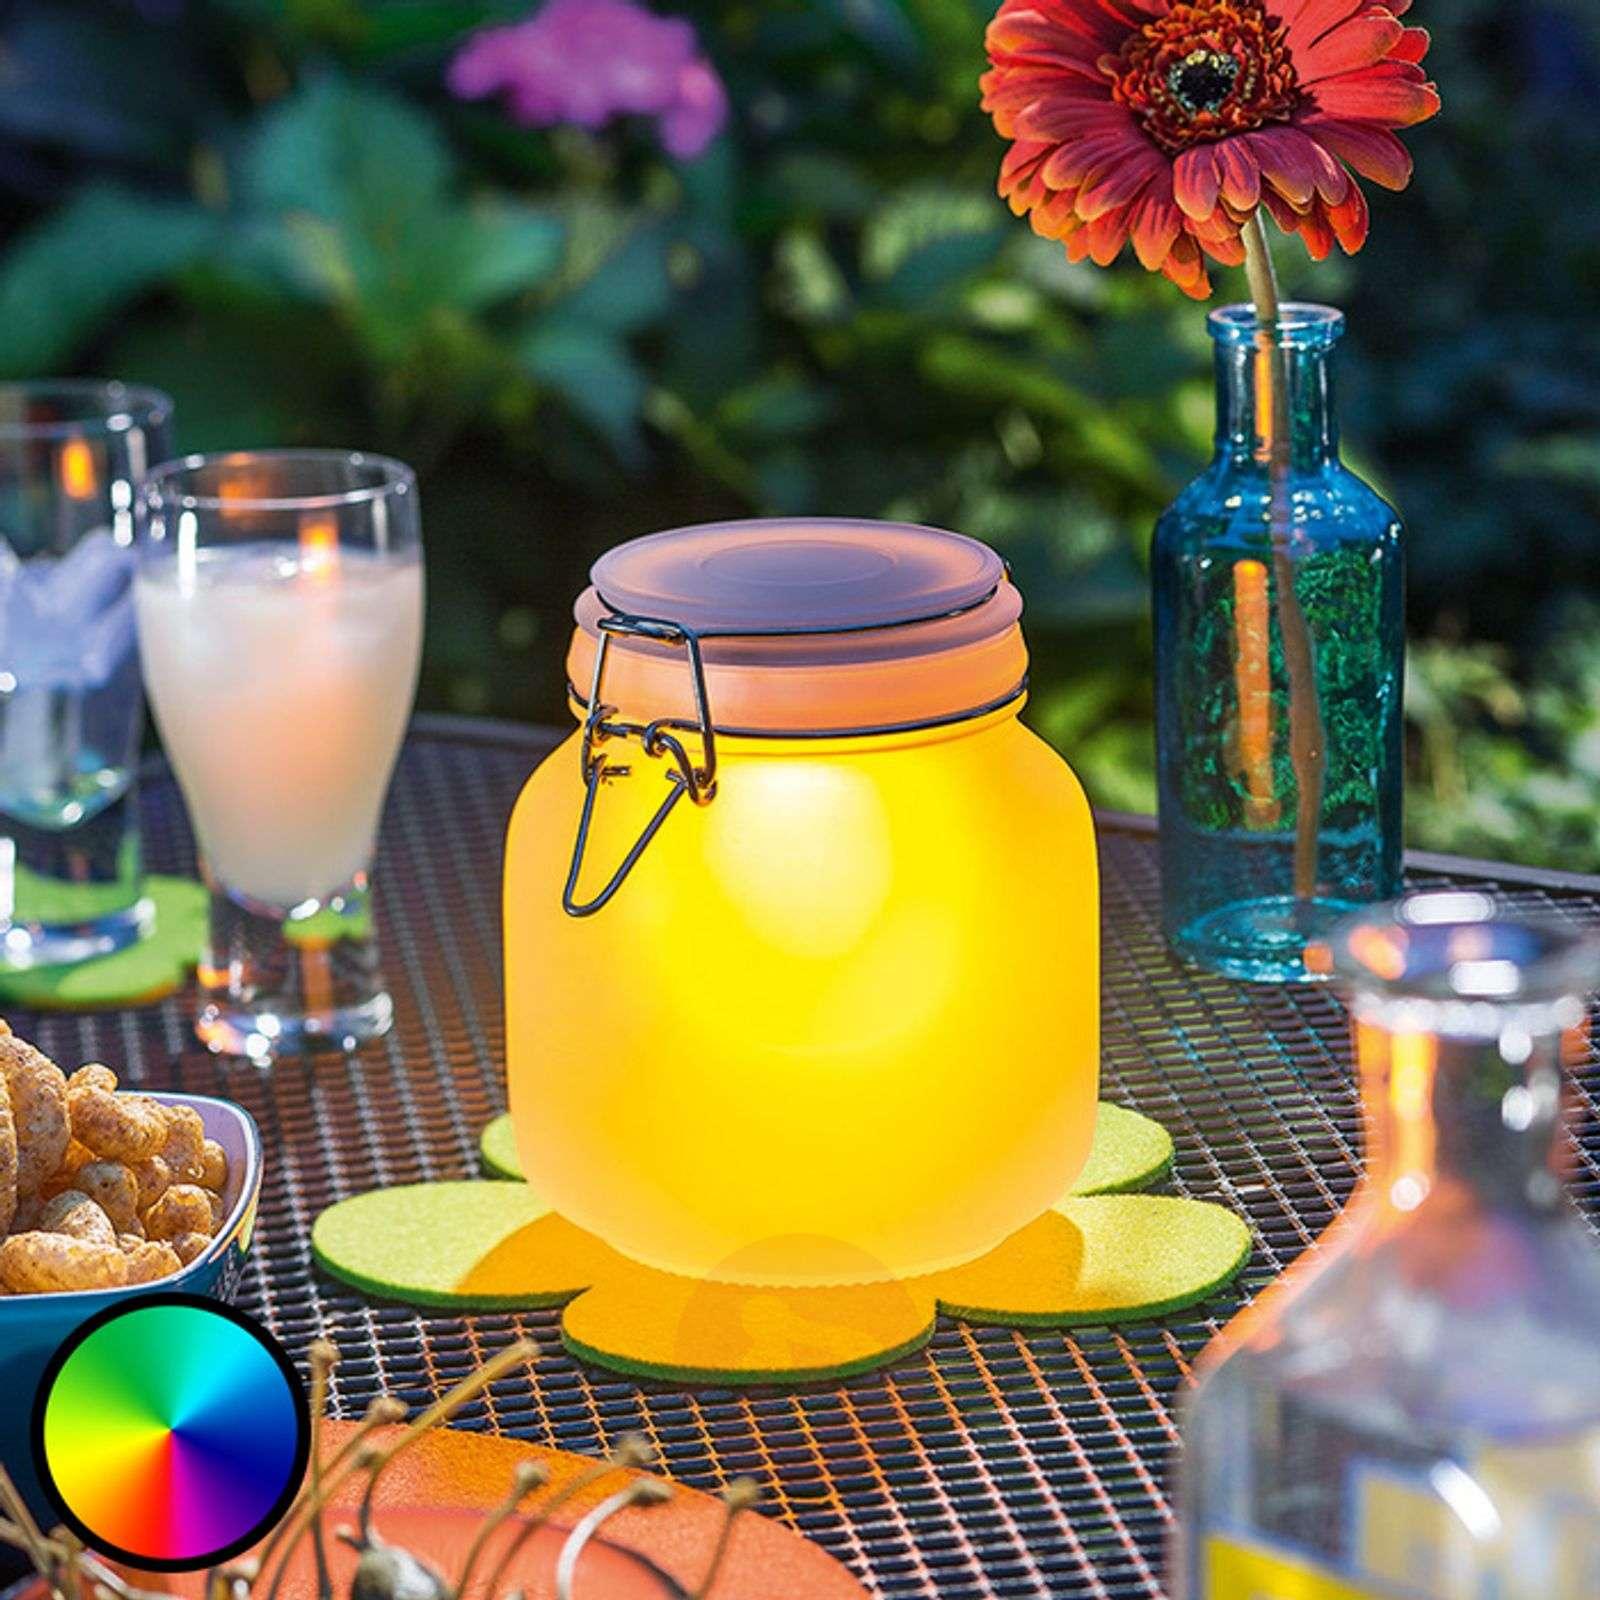 Decorative LED glass Satin Glass, solar powered-3012515-01